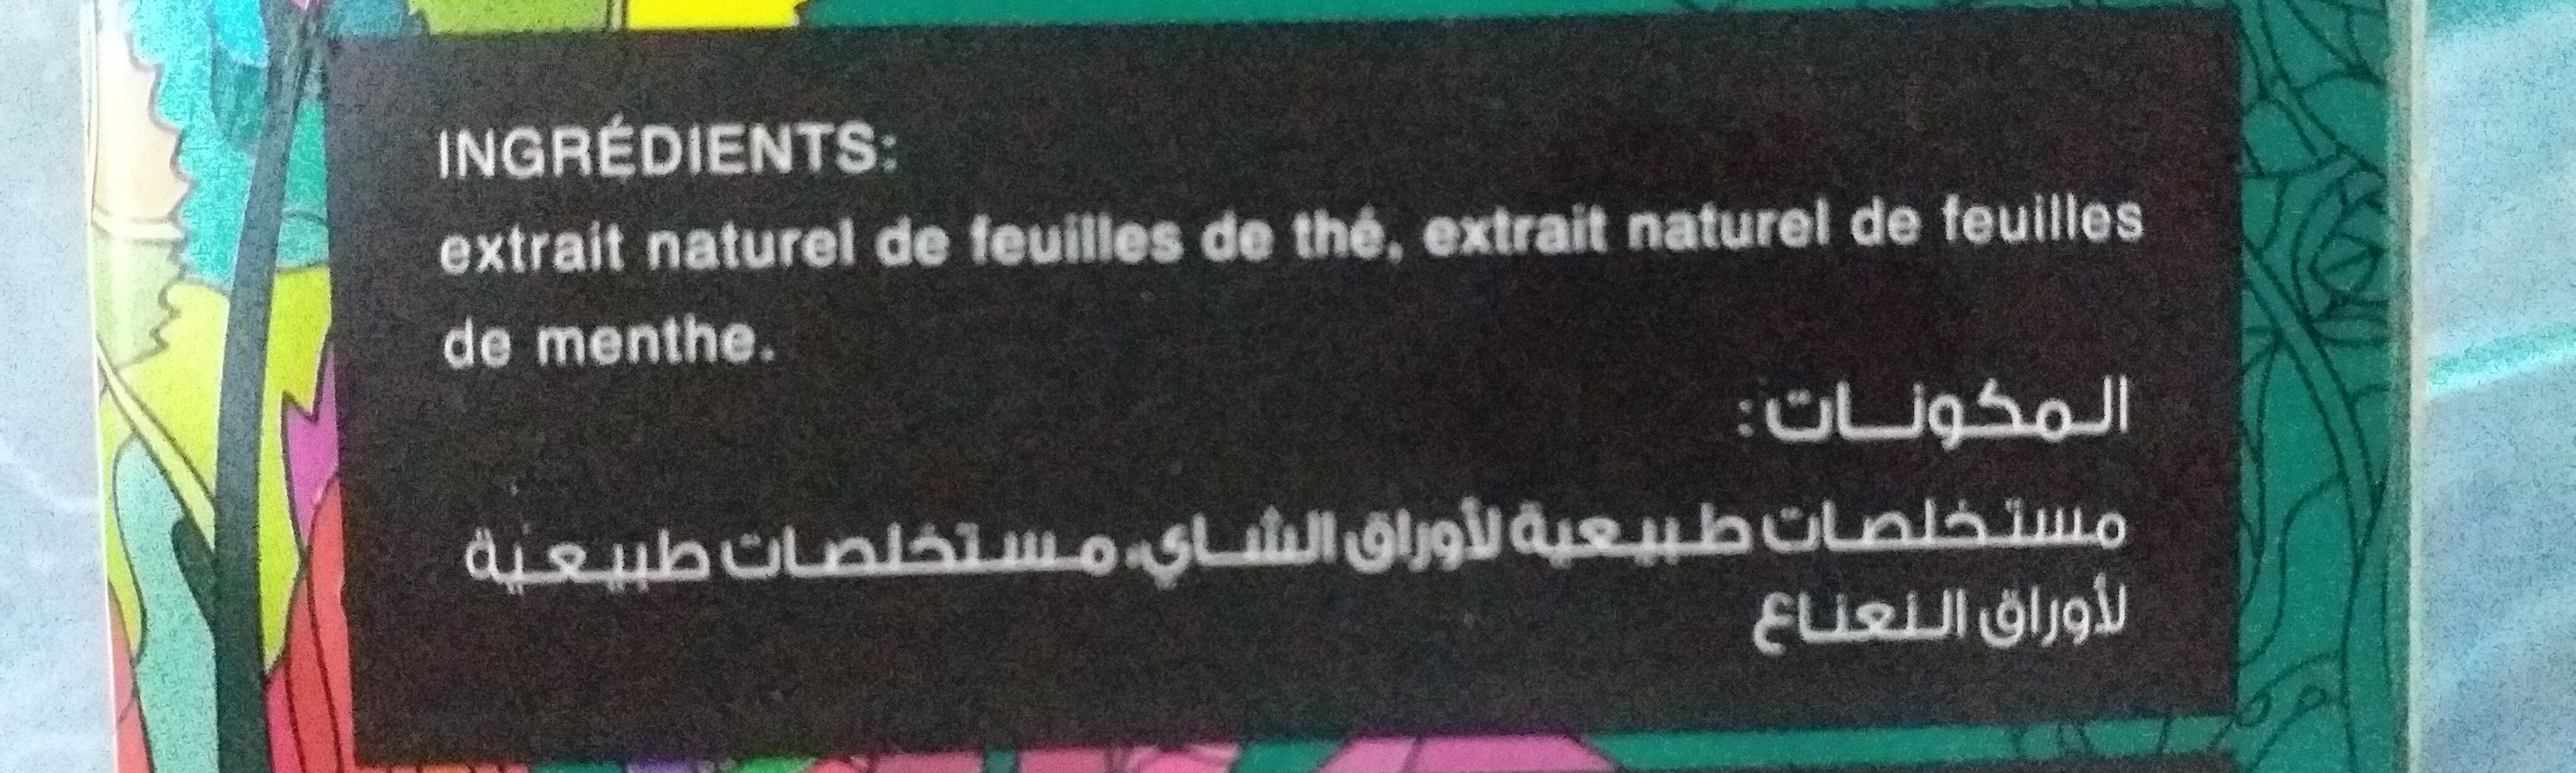 KYUFI thé vert soluble à la menthe - المكونات - fr